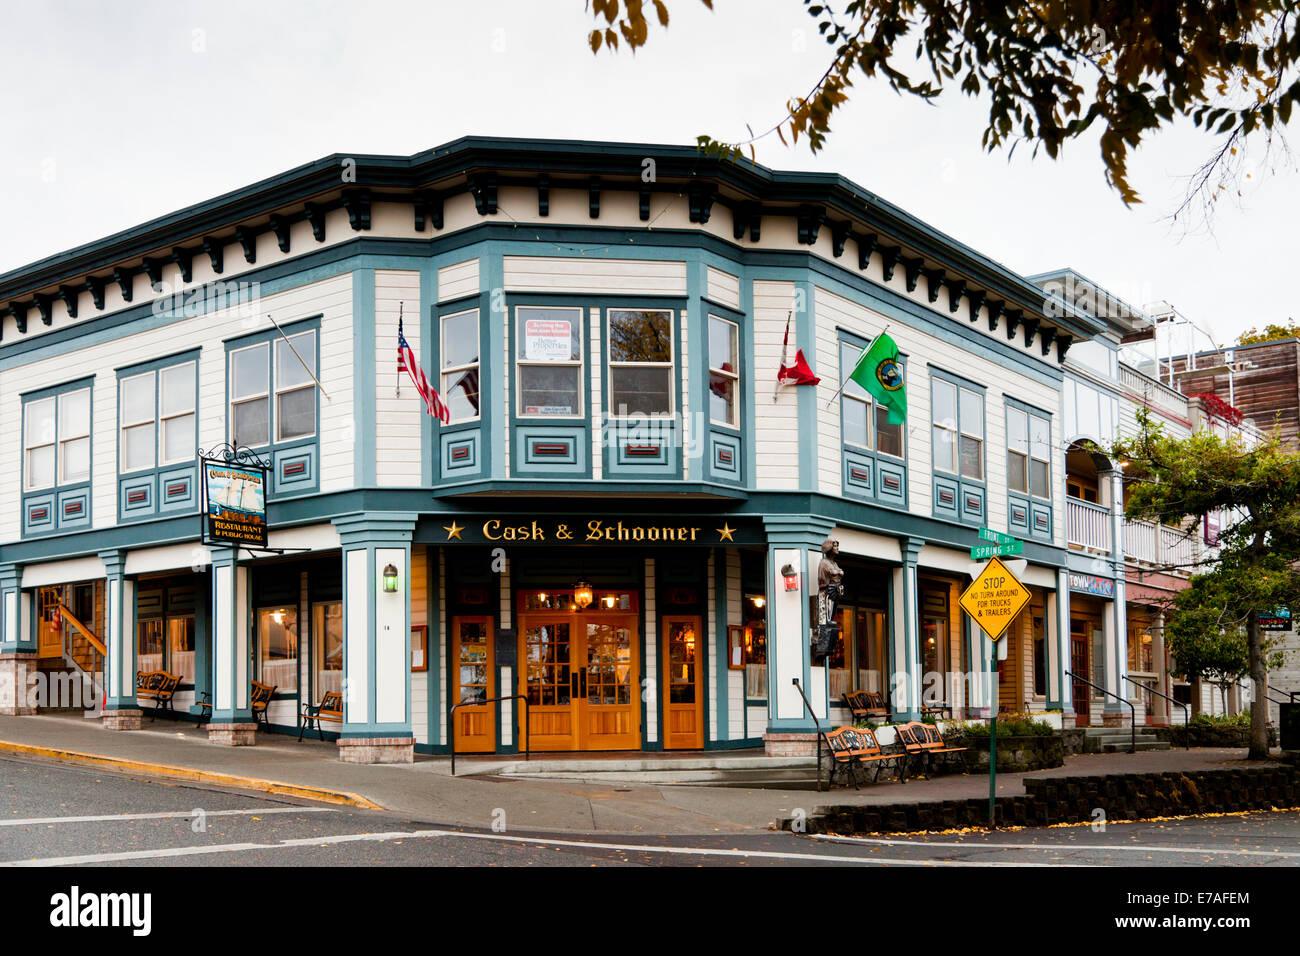 Cask And Schooner Public House Restaurant